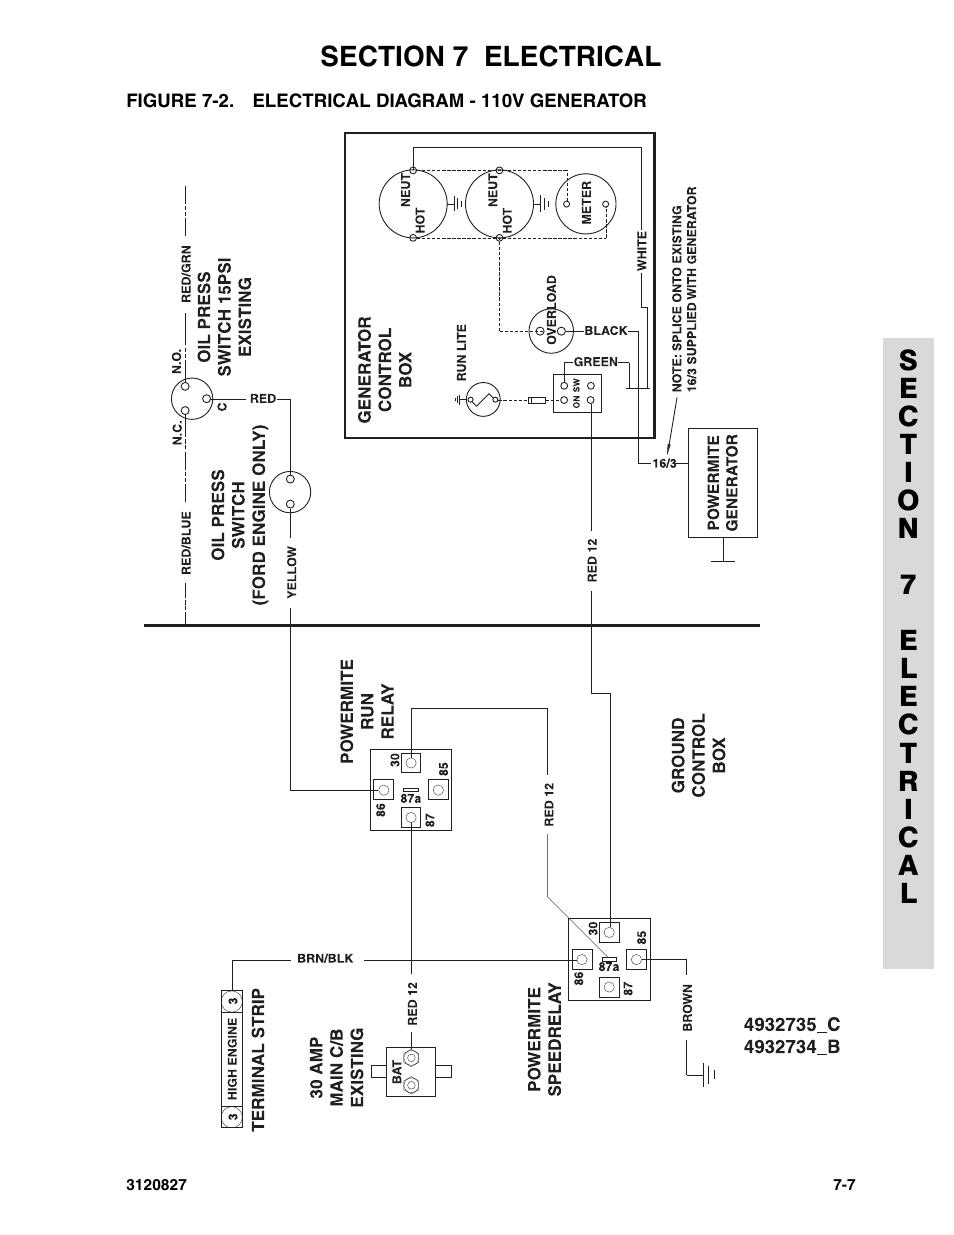 Jlg Wiring Diagram - Wiring Diagram Description